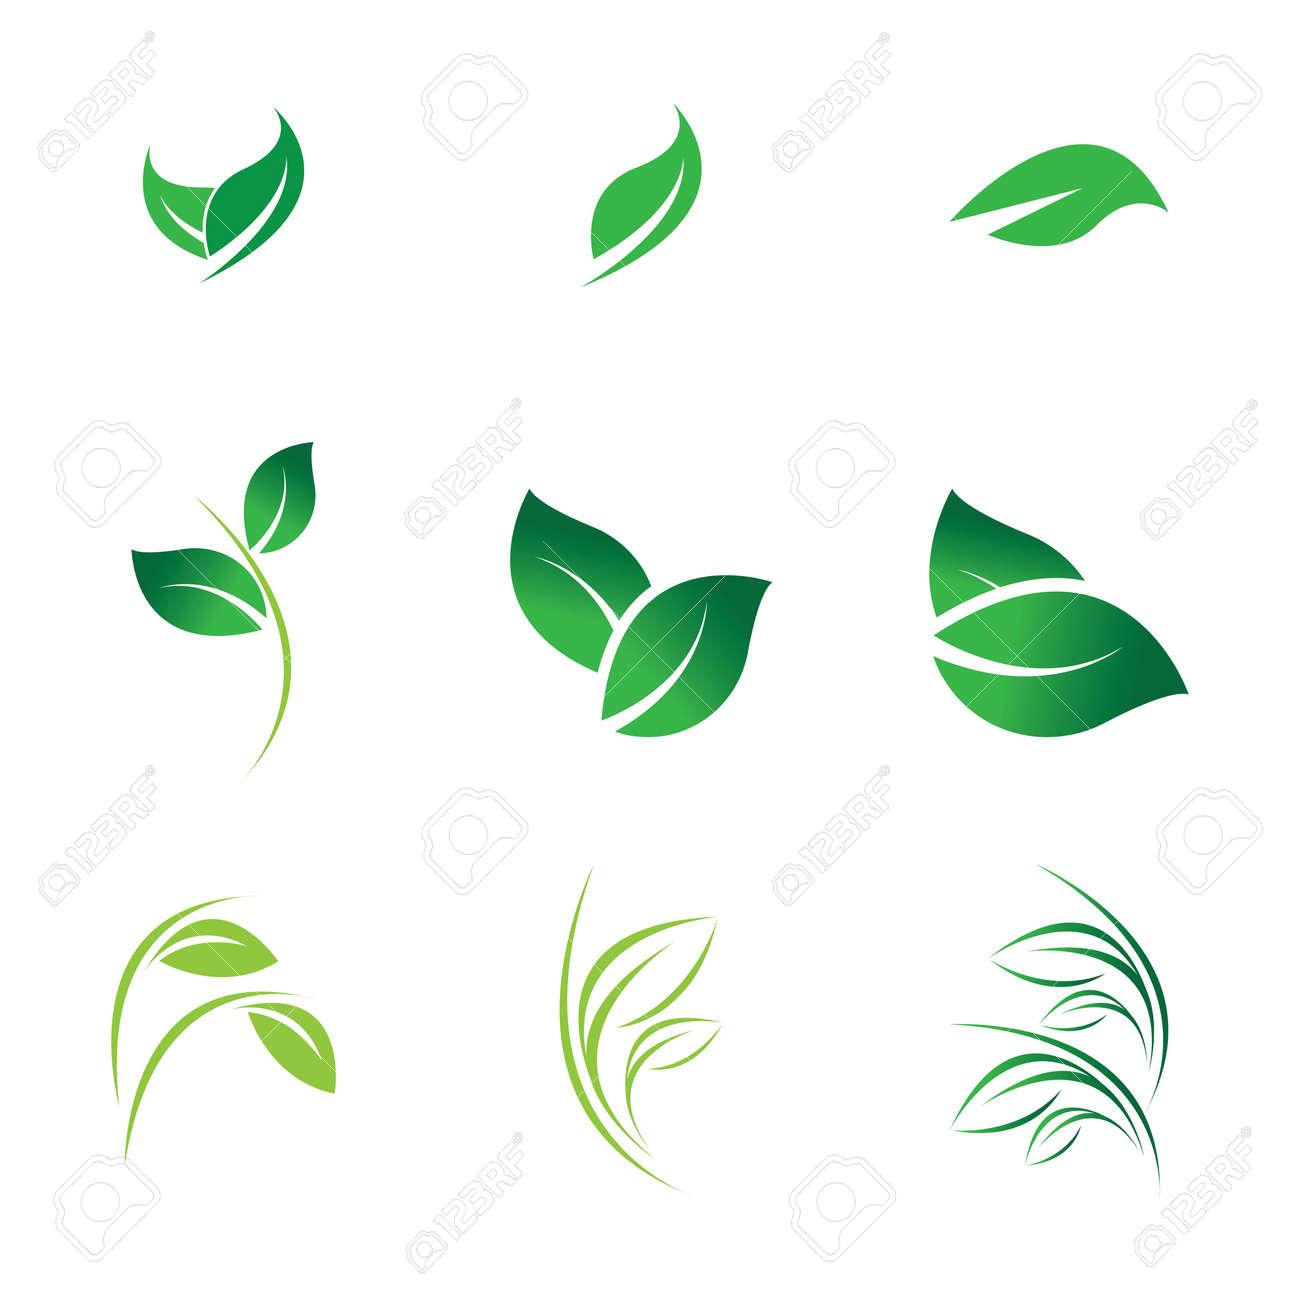 green leaf logo vector - 166708669